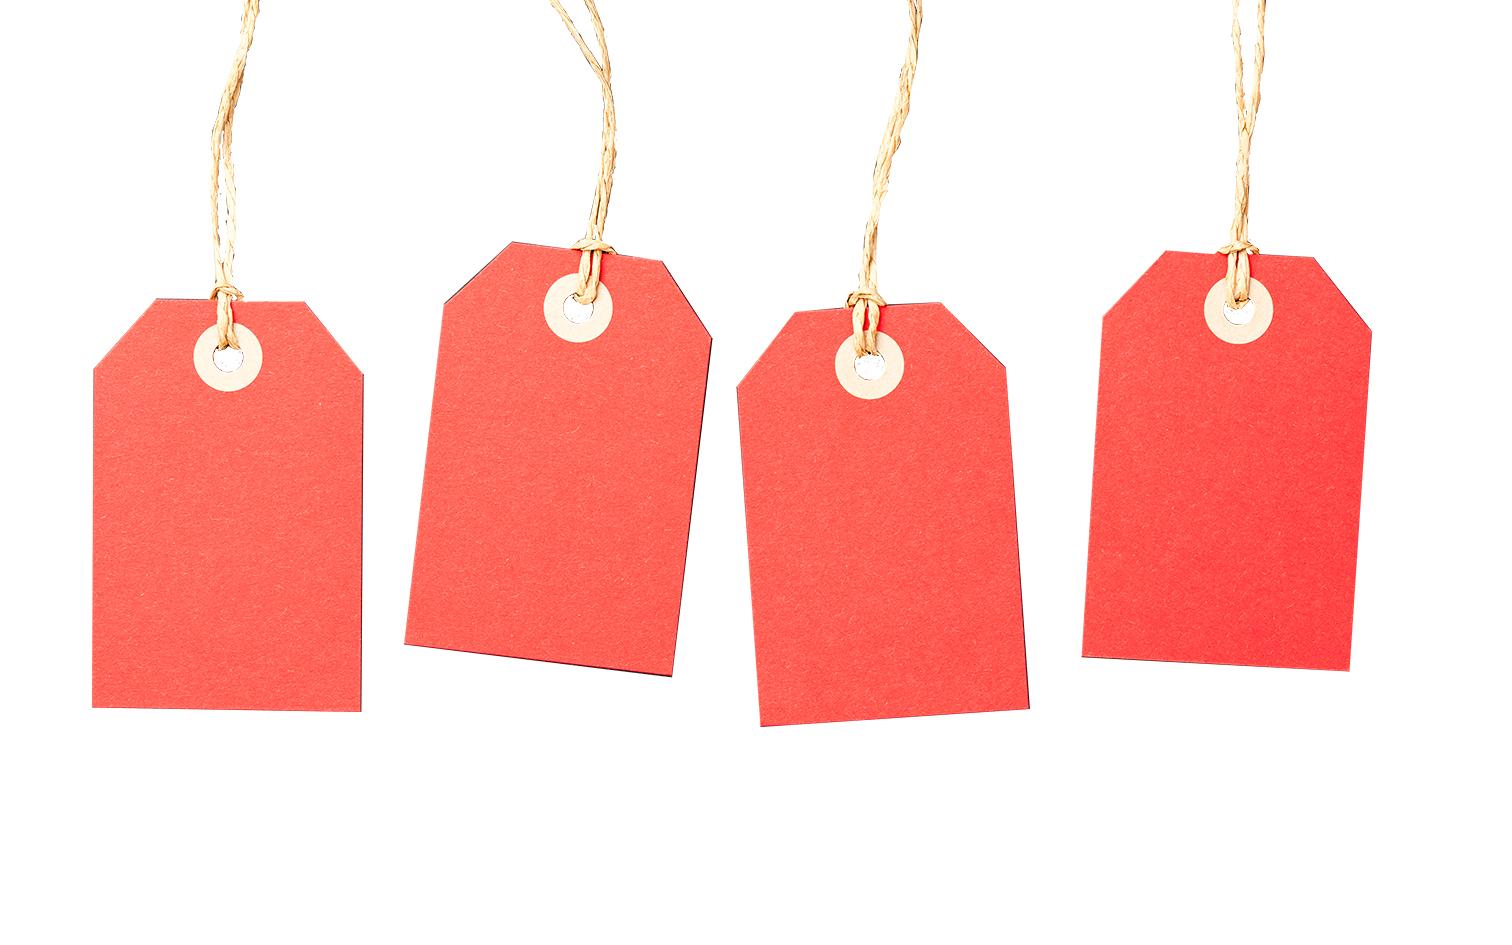 red-blank-tags-on-black-P6CDWYC.jpg